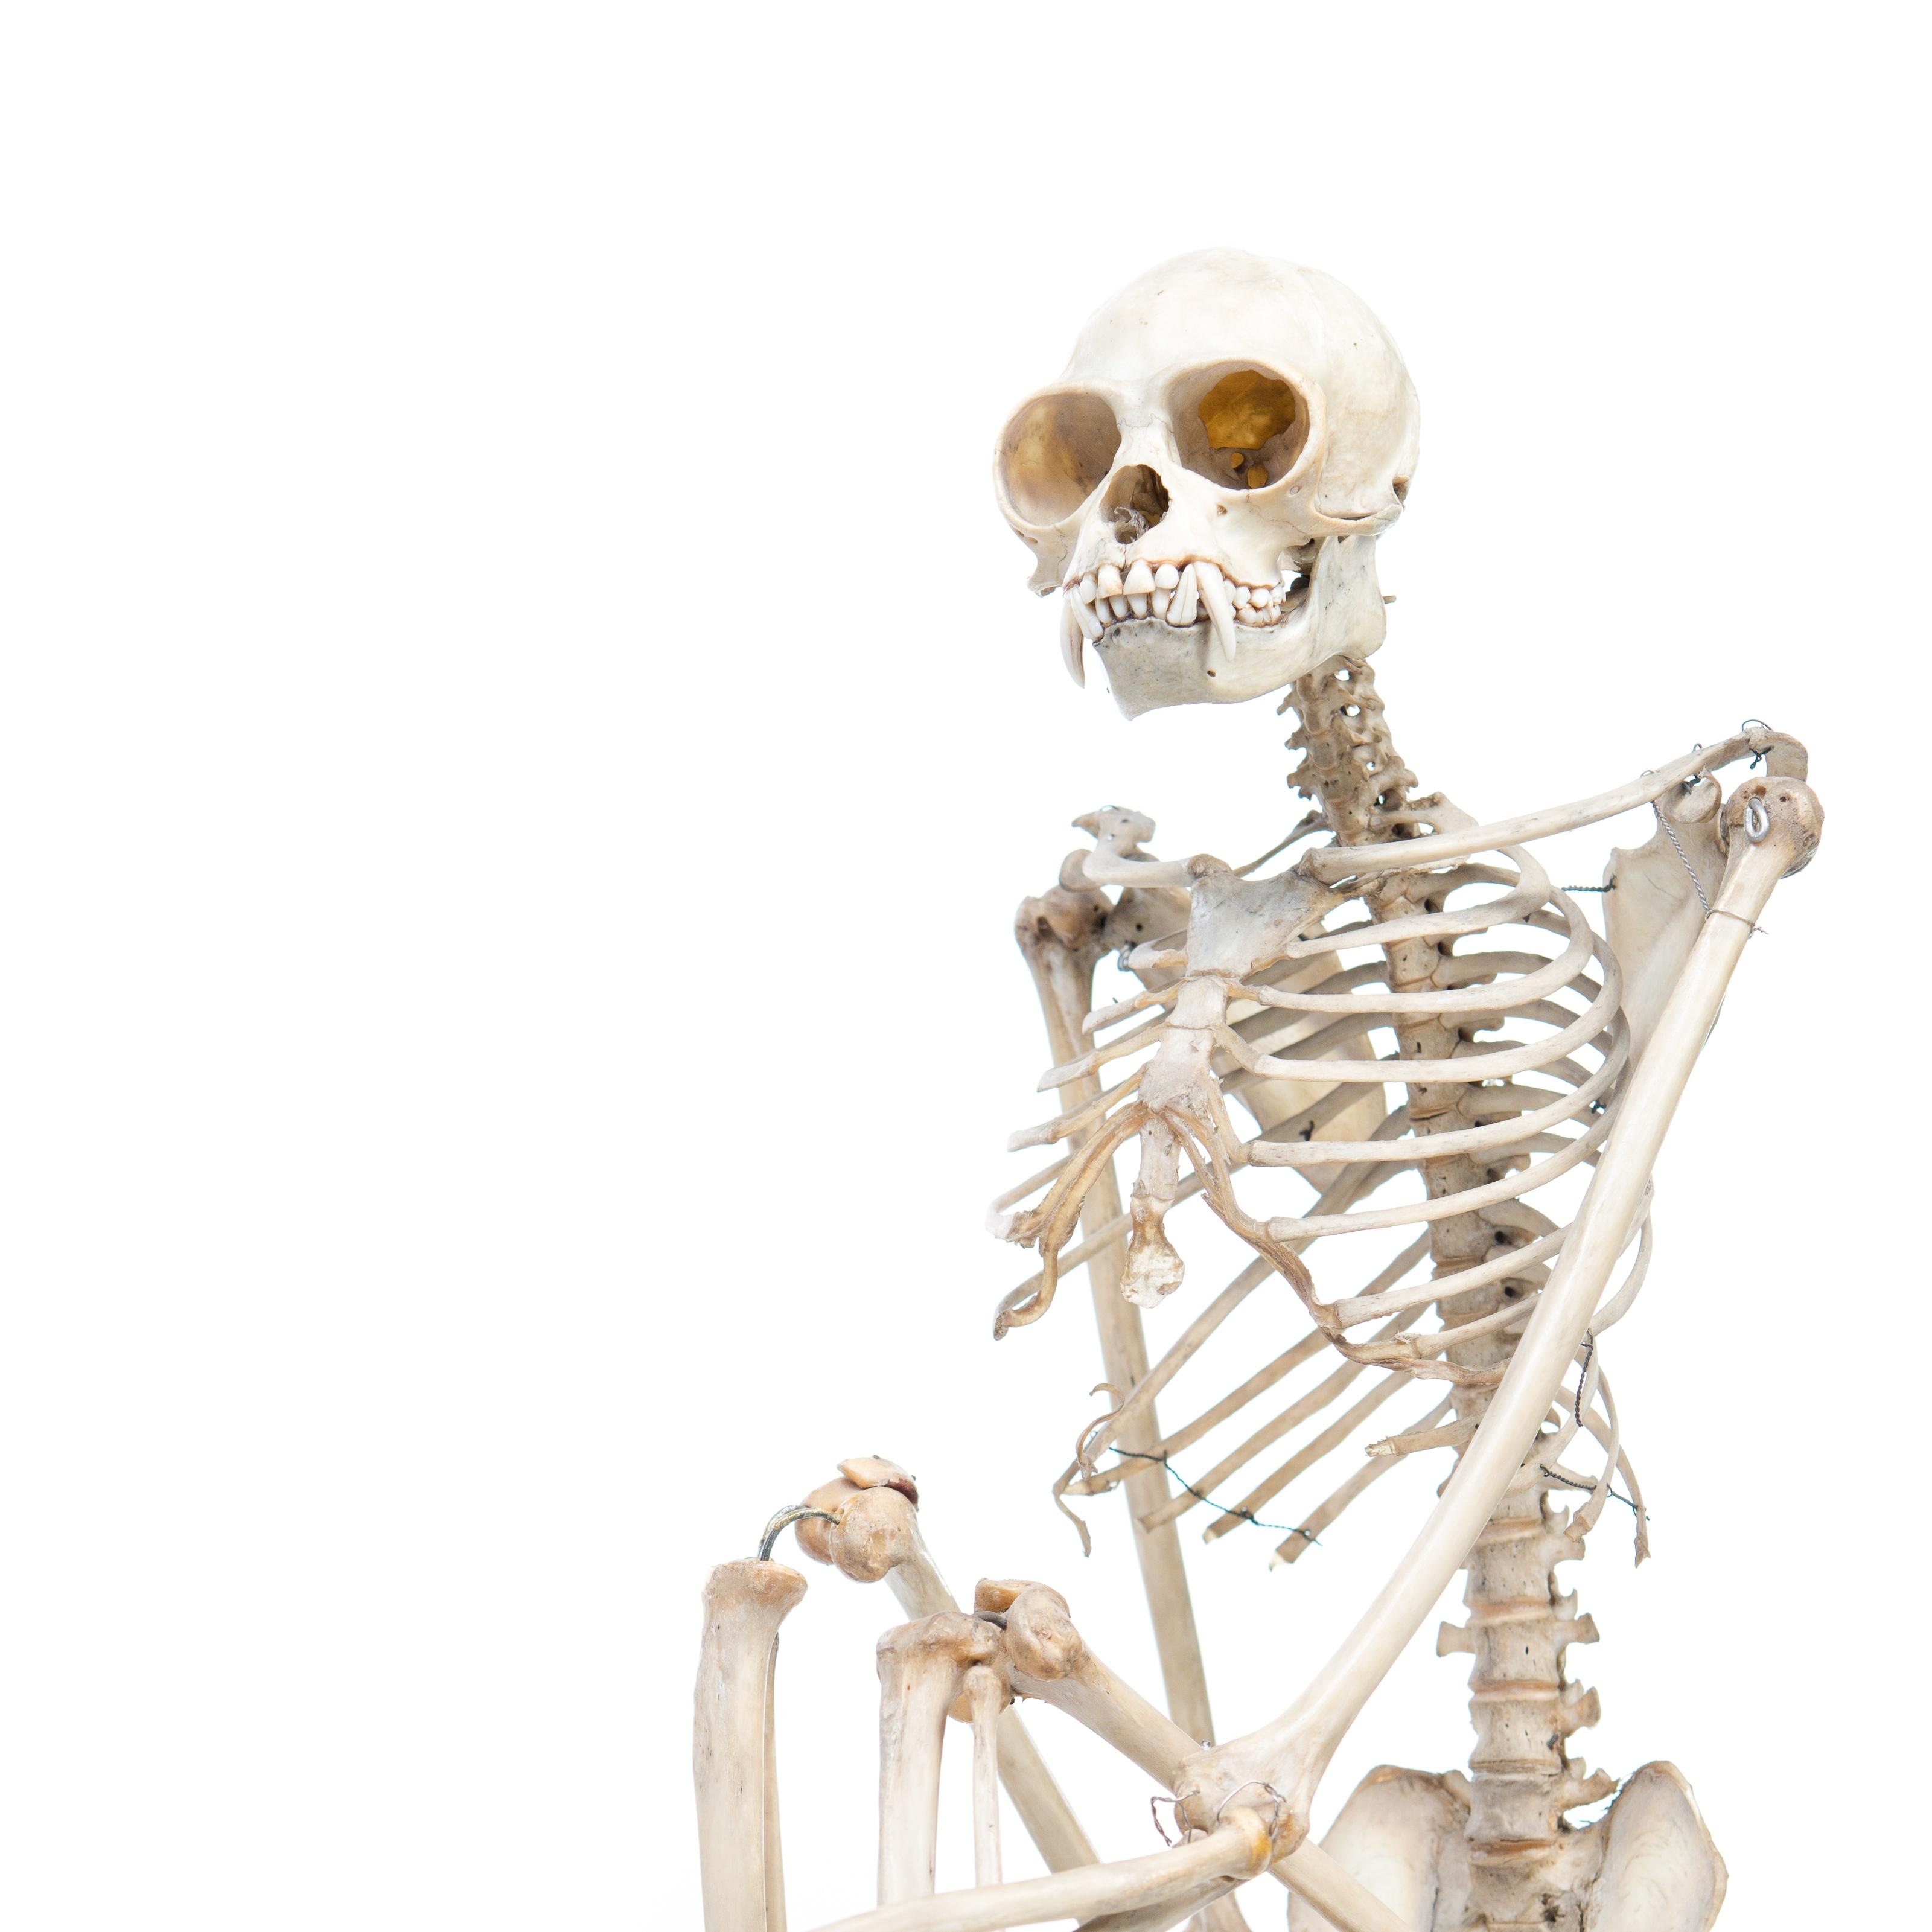 Colour photo of a gibbon skeleton sitting upright